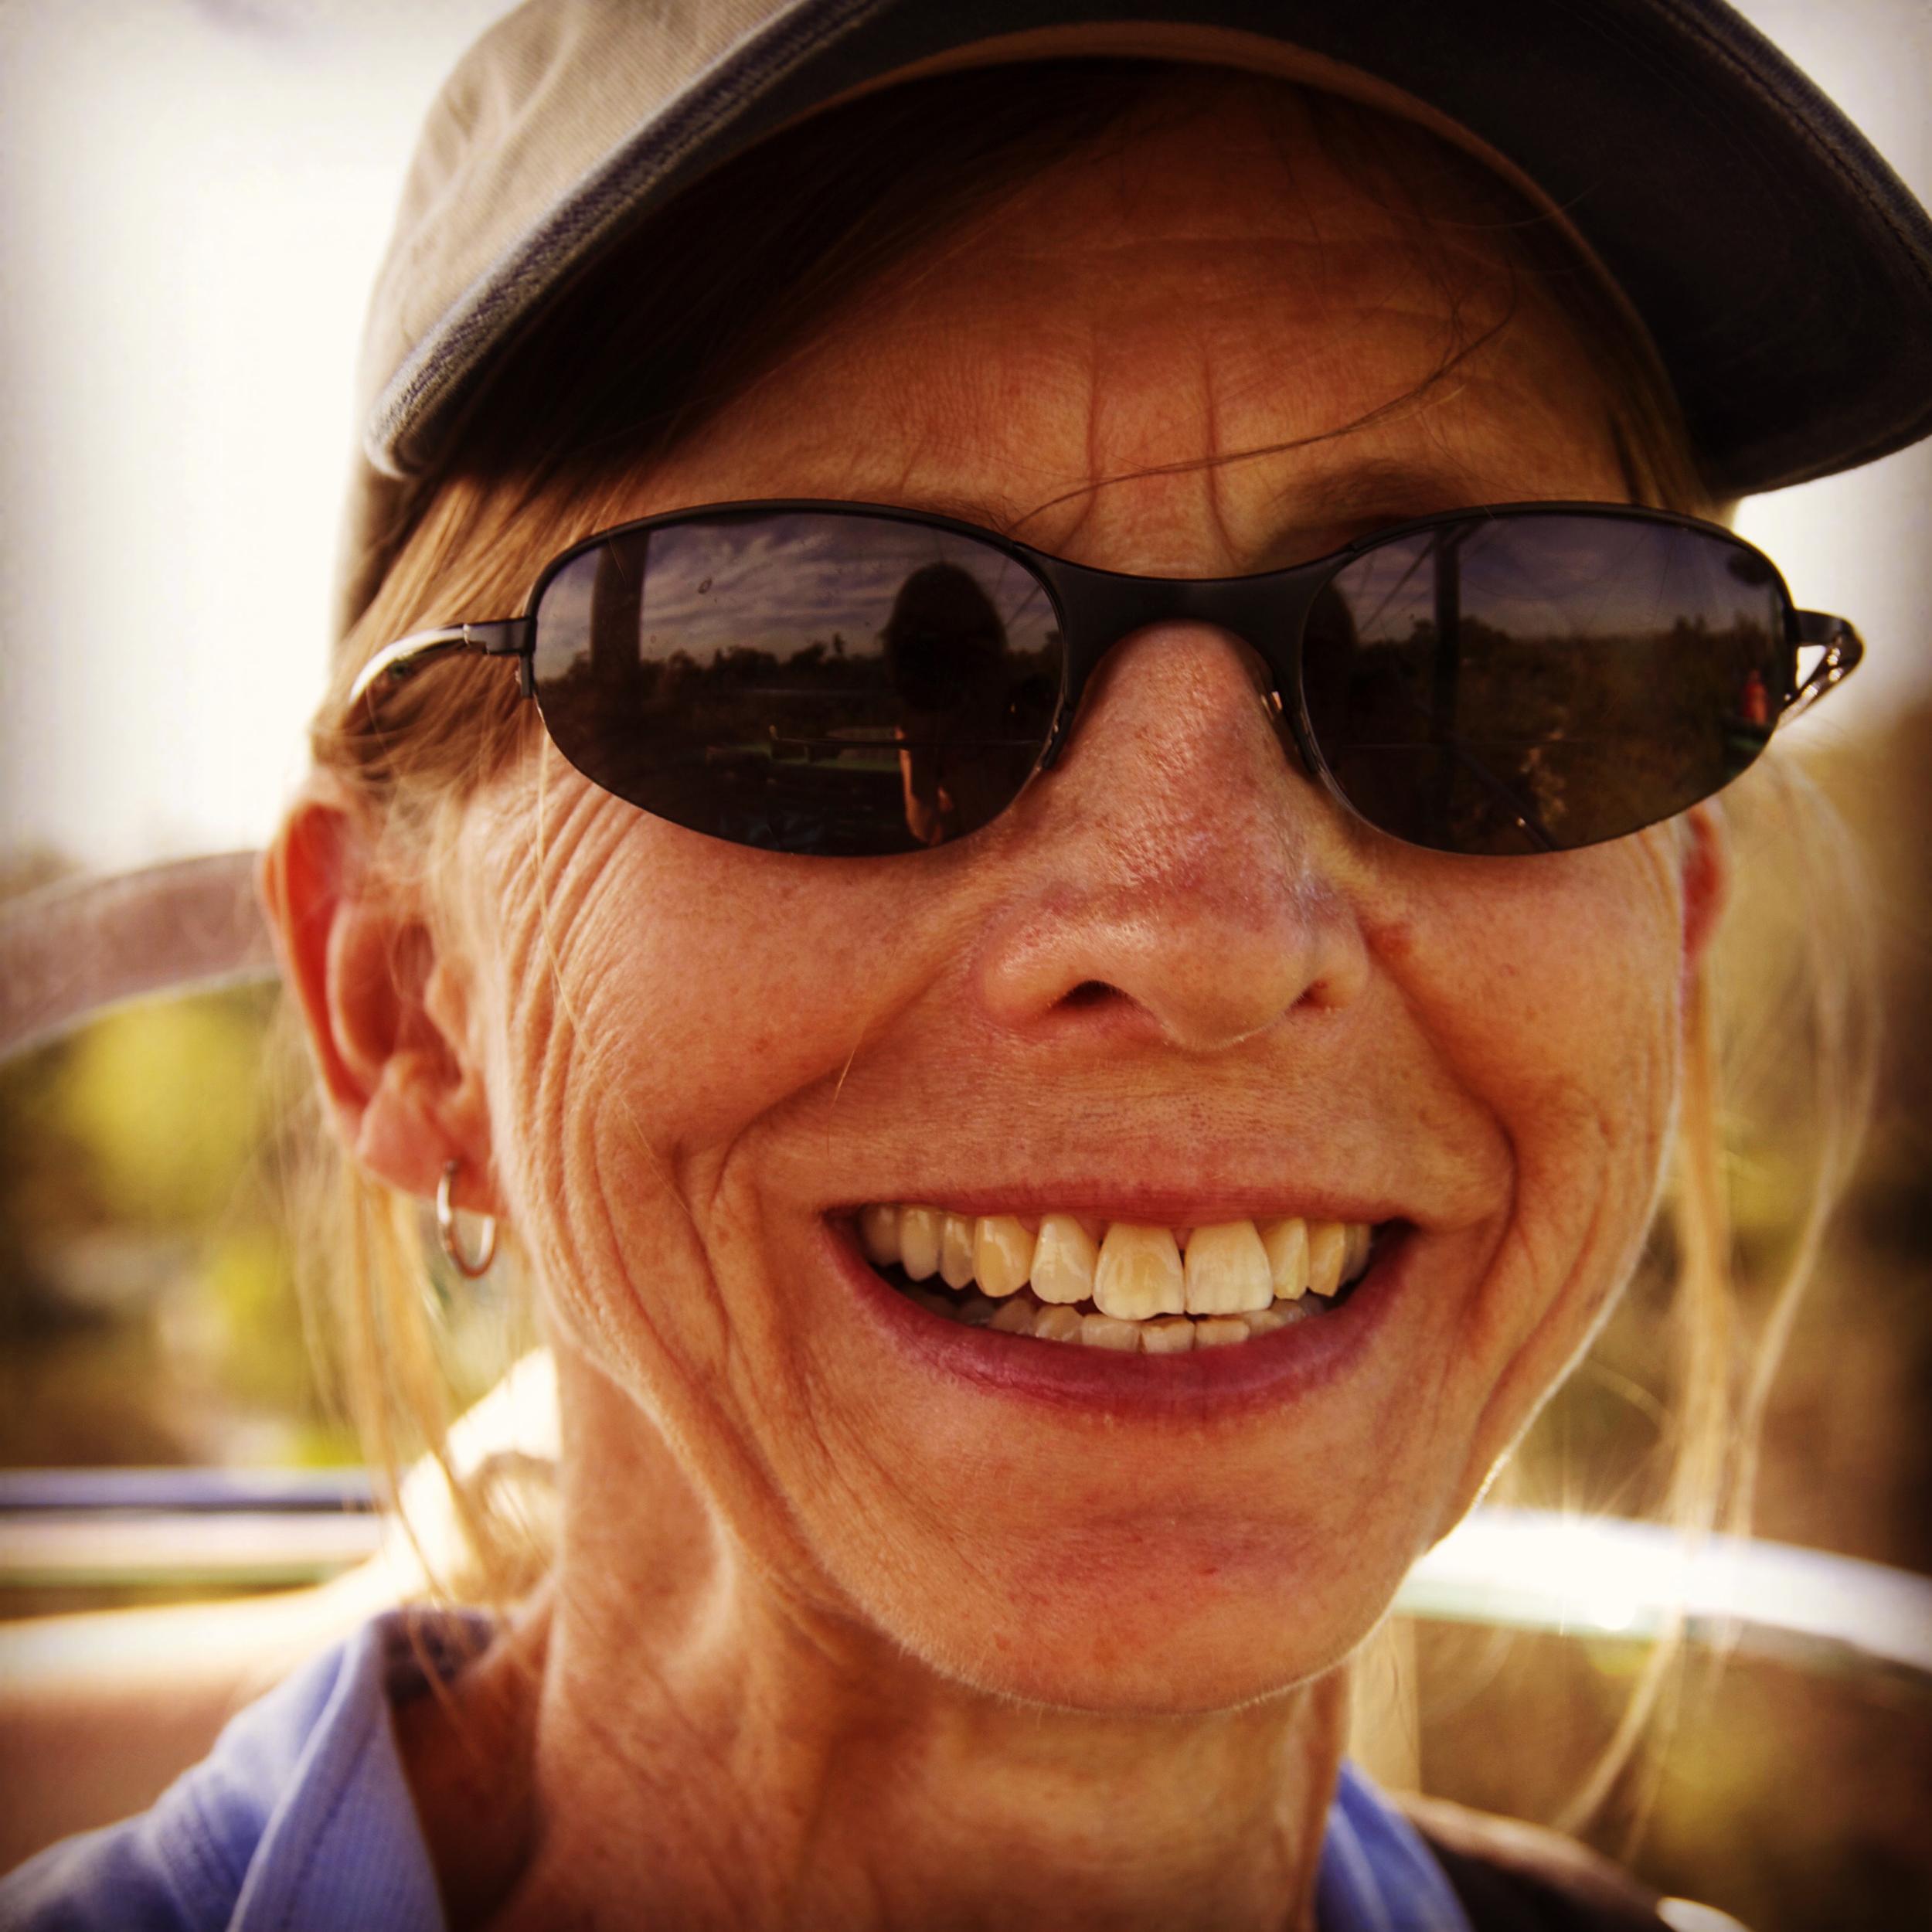 The reporter's mom, Lynn Shepherd, October 17, 2012. Stephanie Joyce.